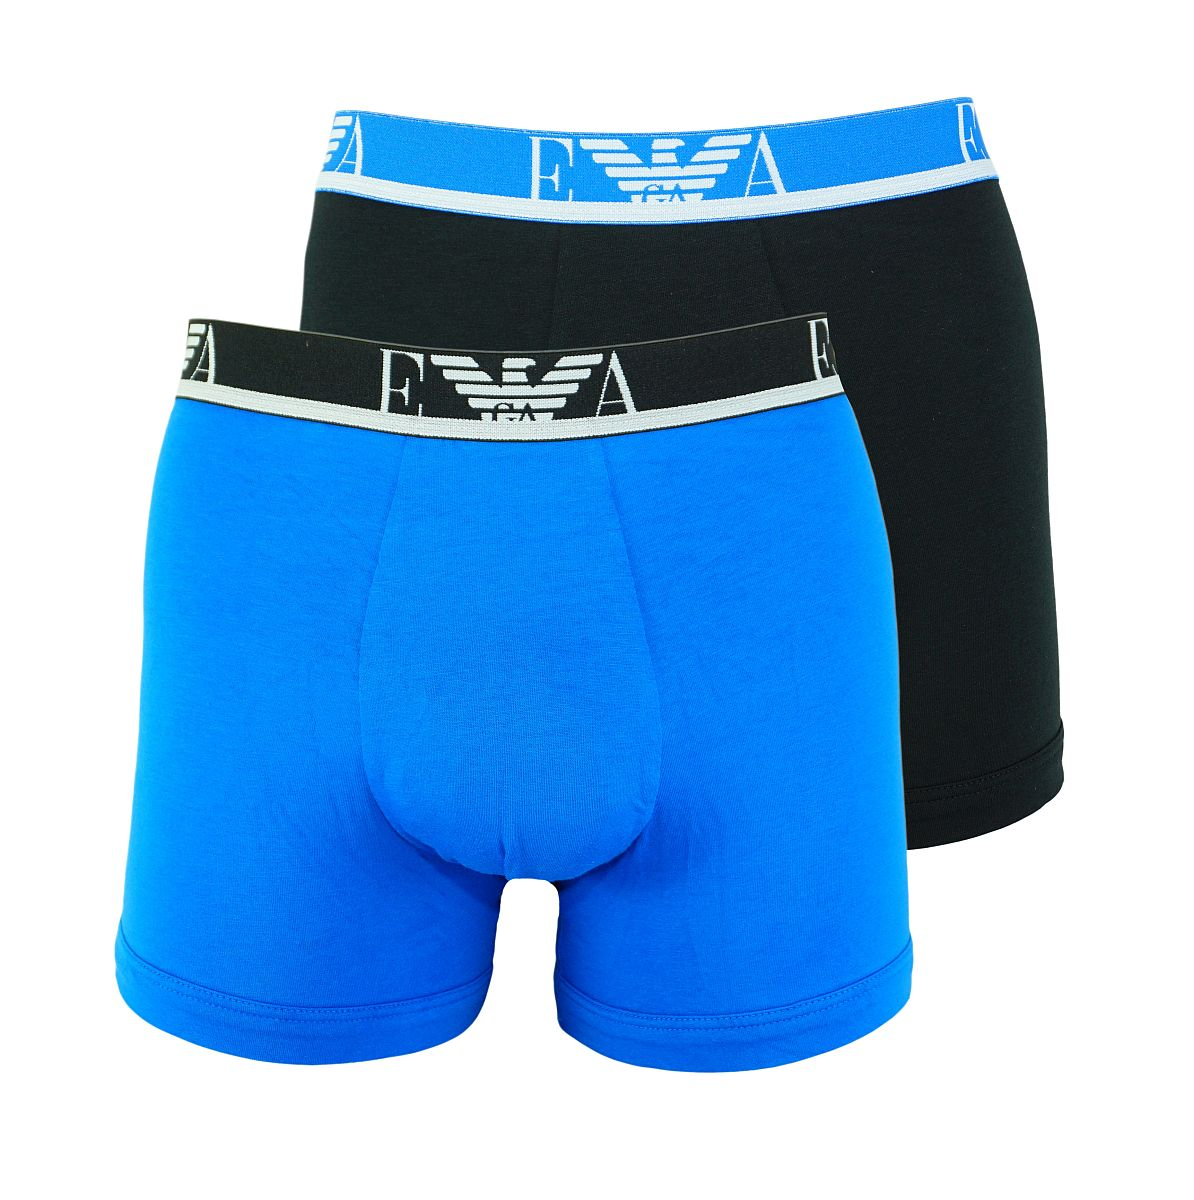 Emporio Armani 2er Pack Shorts Boxer Unterhose 111268 8P715 22233 CIELO/NERO W18-EAB1